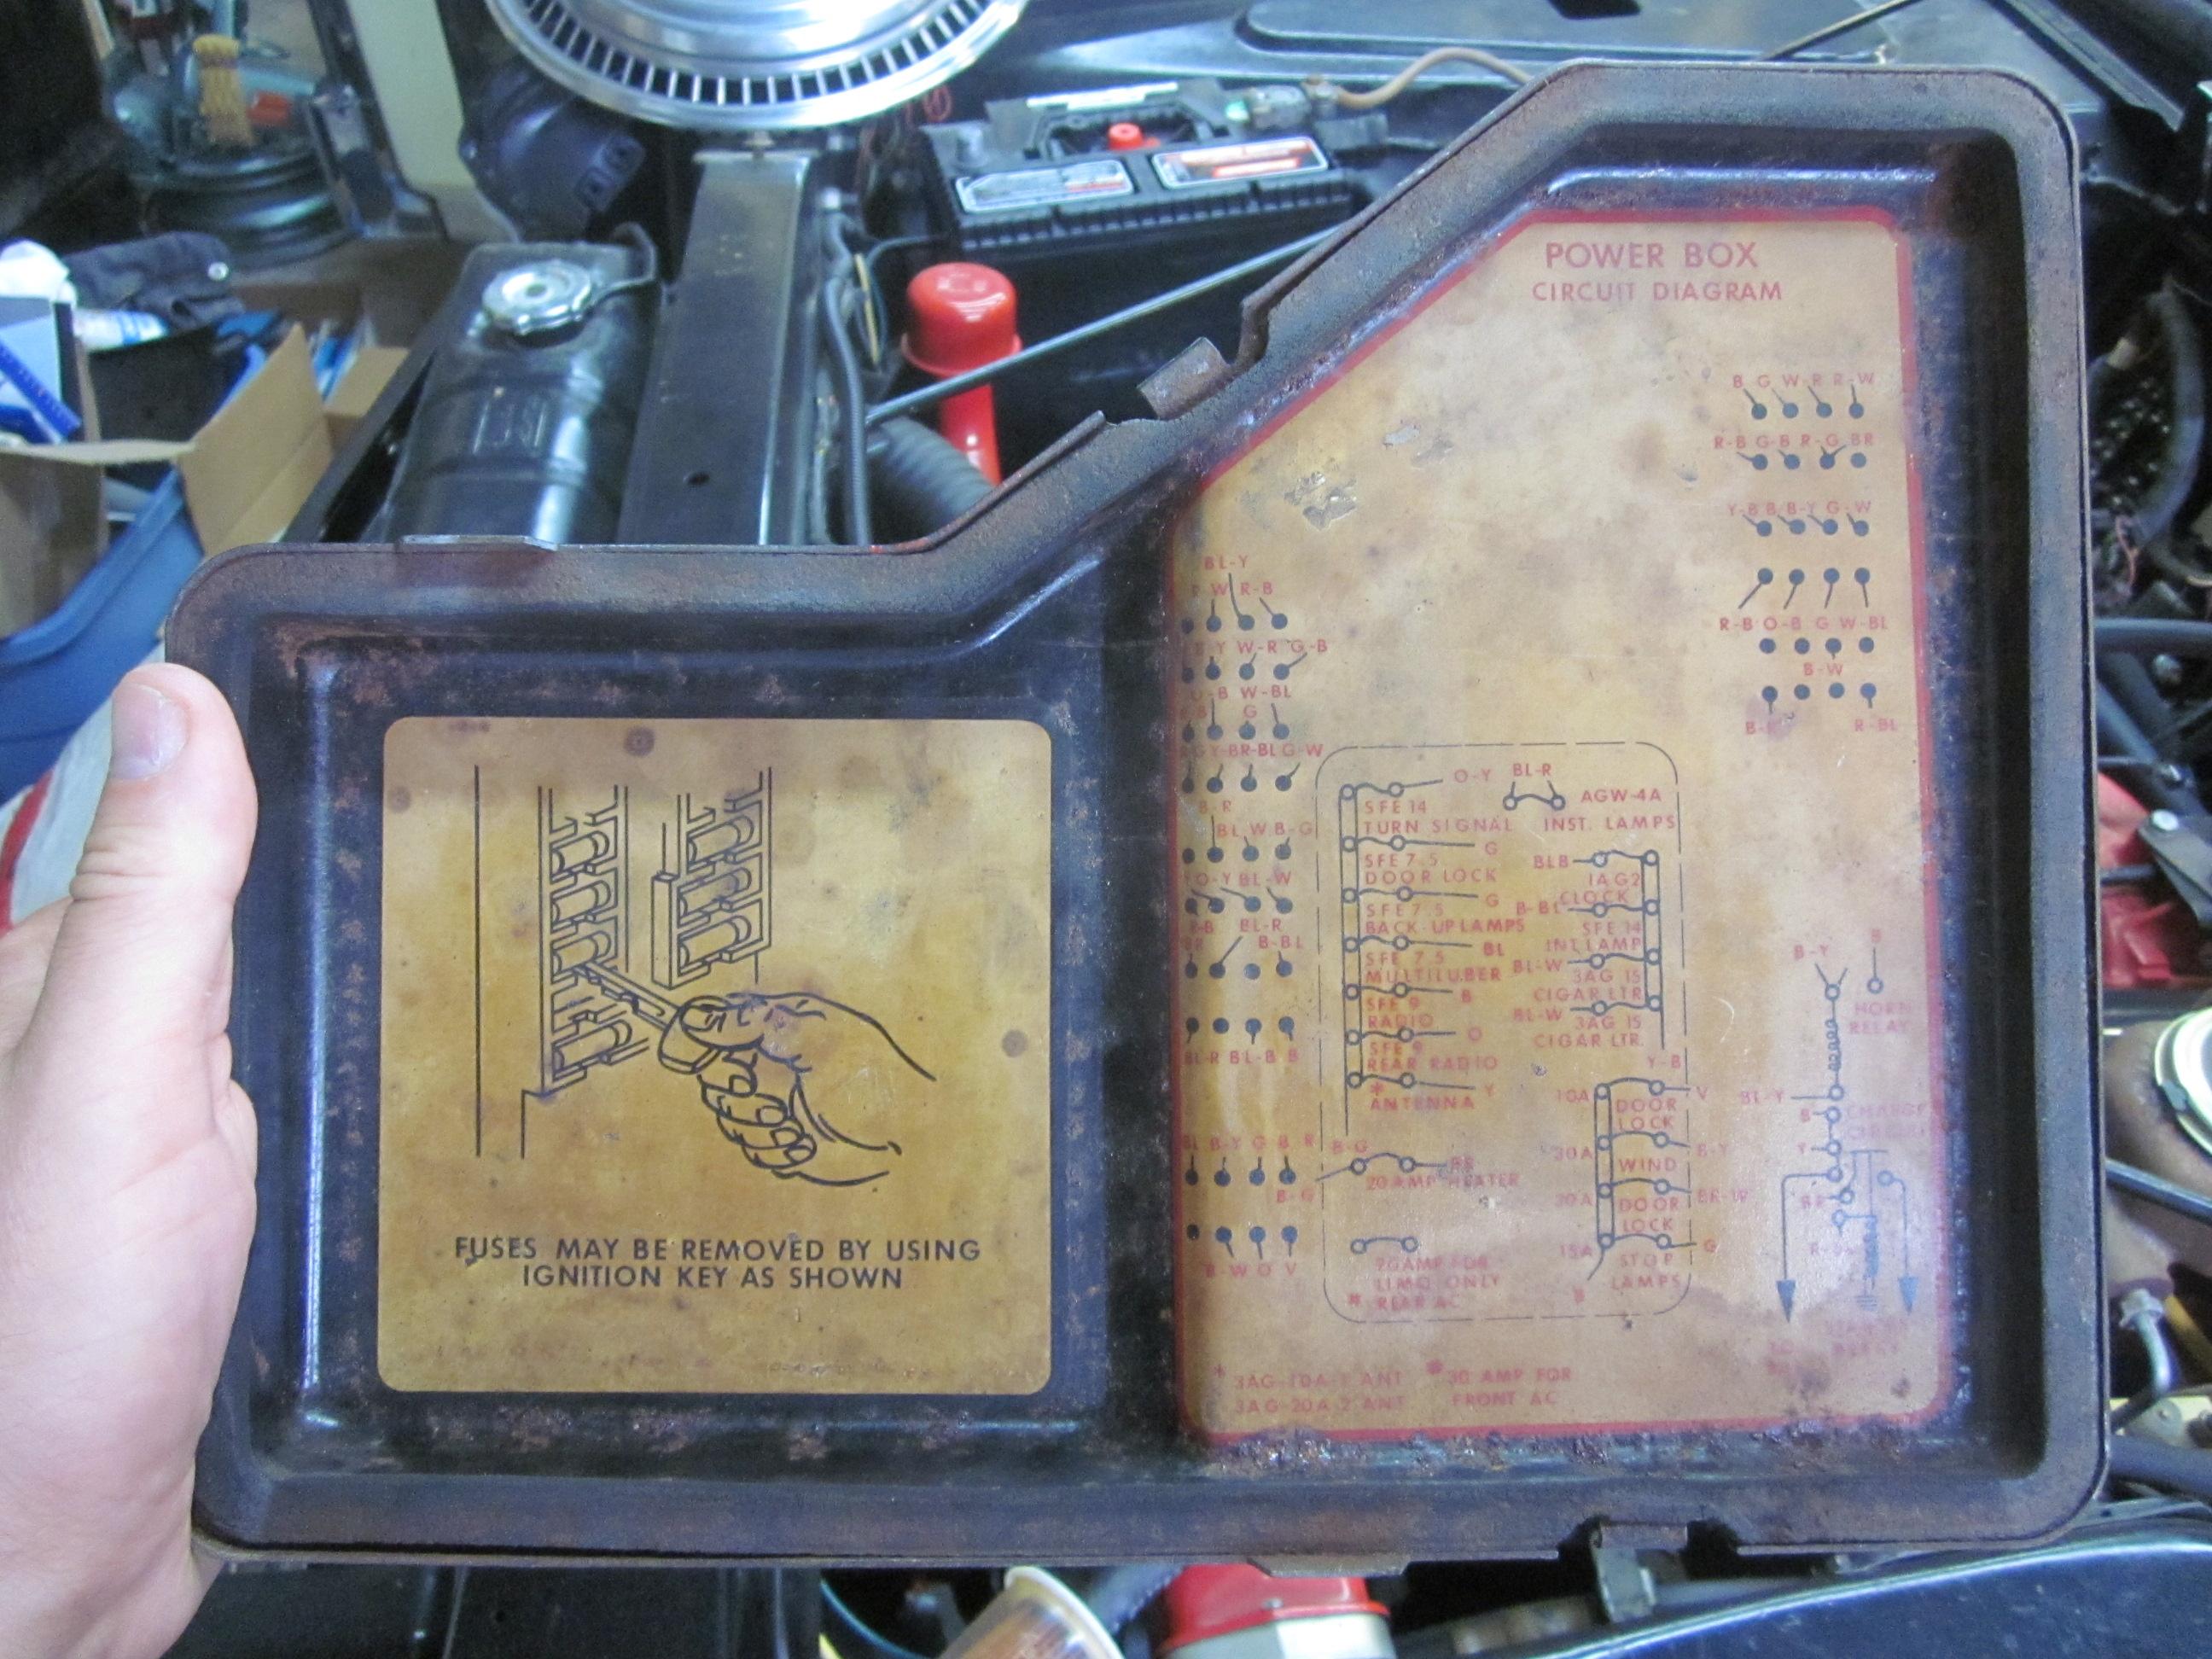 hight resolution of 1967 thunderbird fuse box wiring diagram forward1970 ford thunderbird fuse box diagram wiring diagrams mon 1967